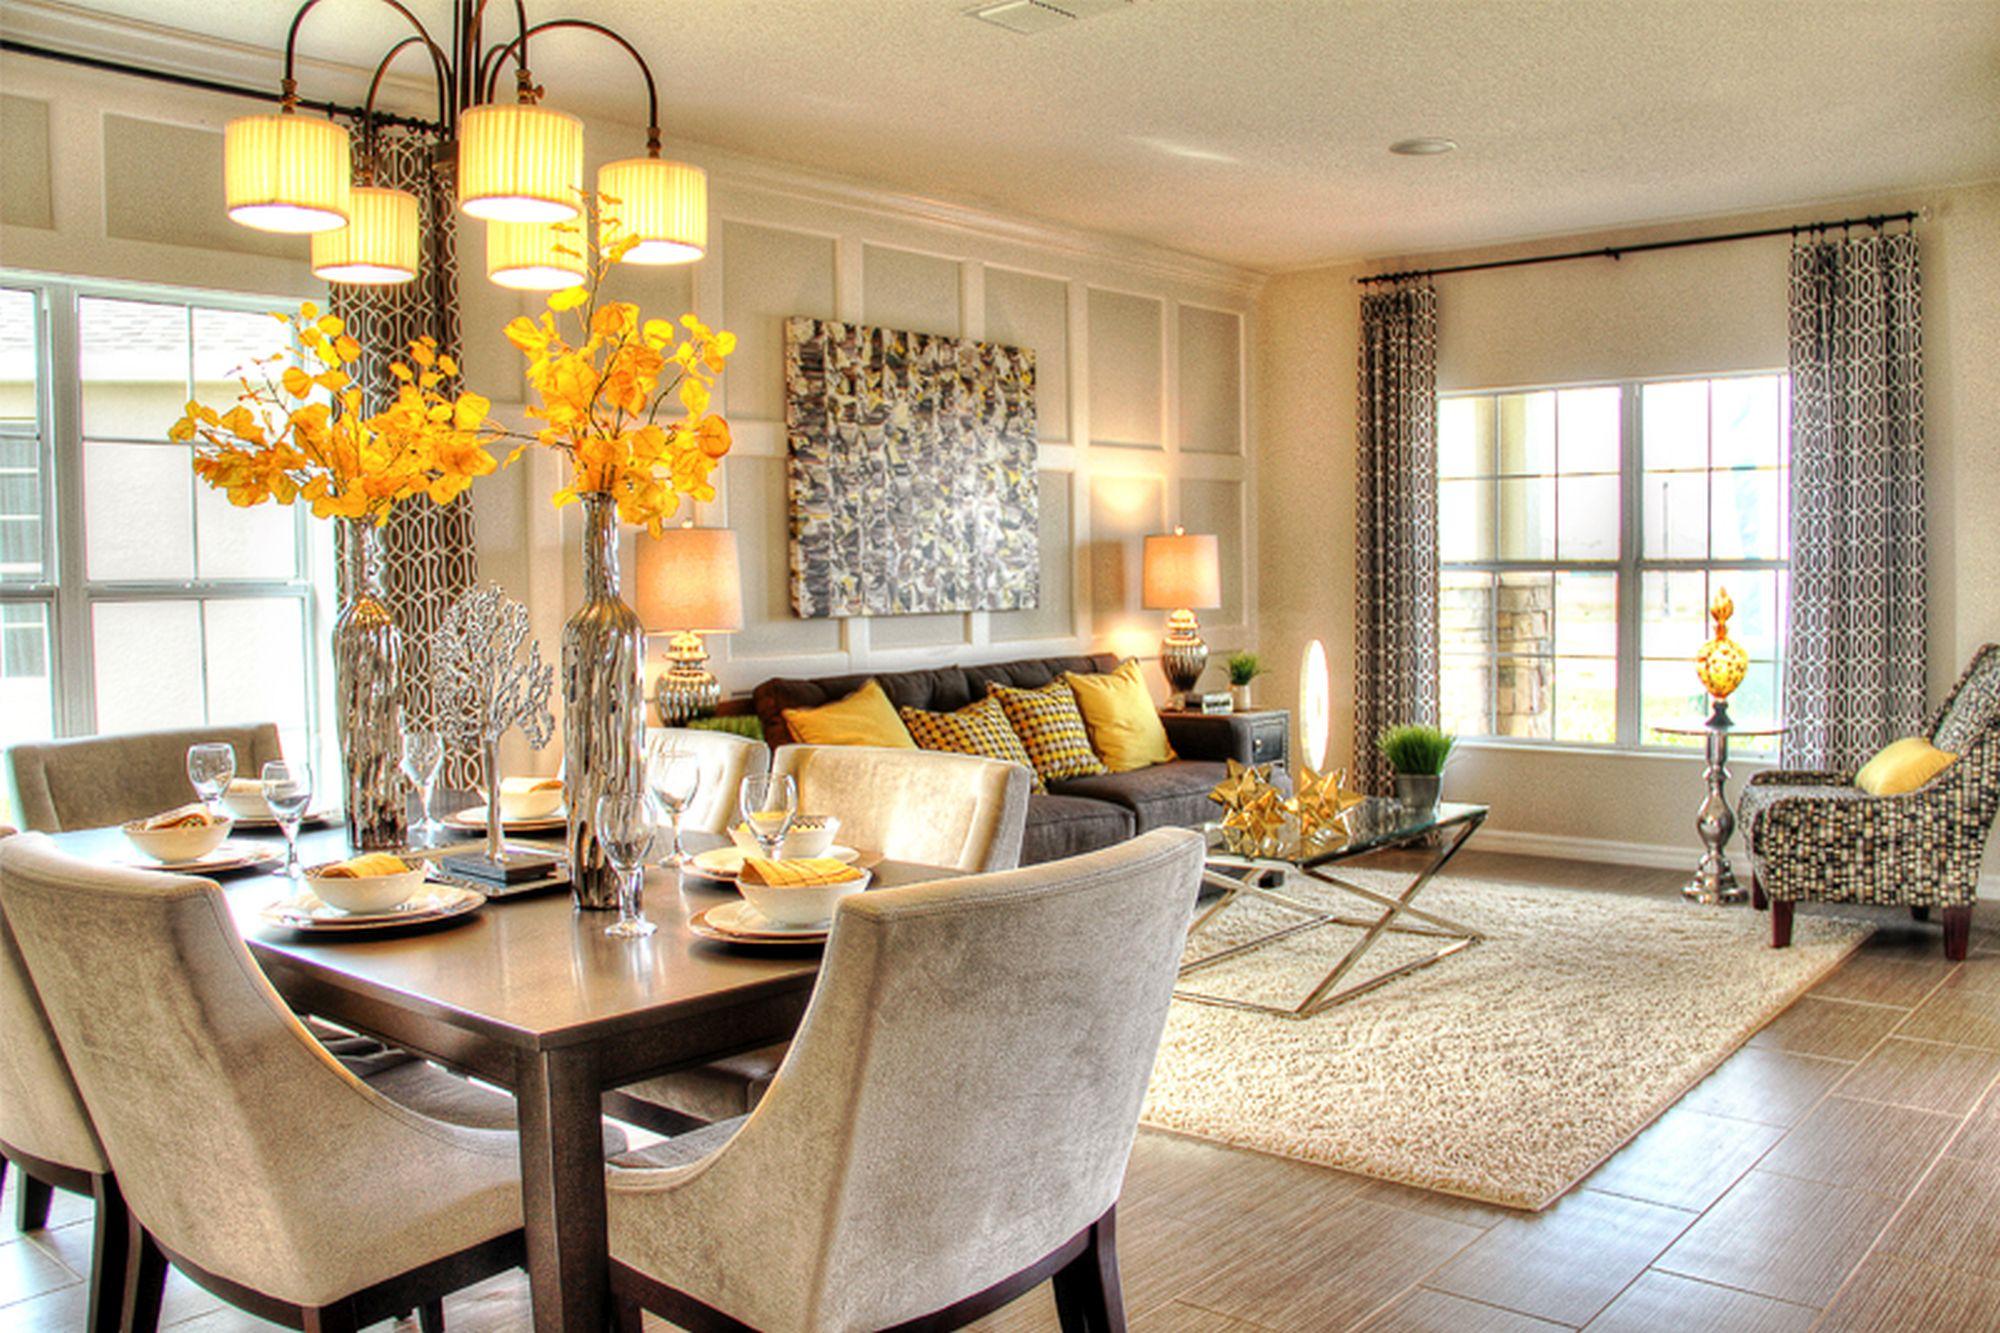 Westmorly Dining Room Marbella Resort Davenport, Florida